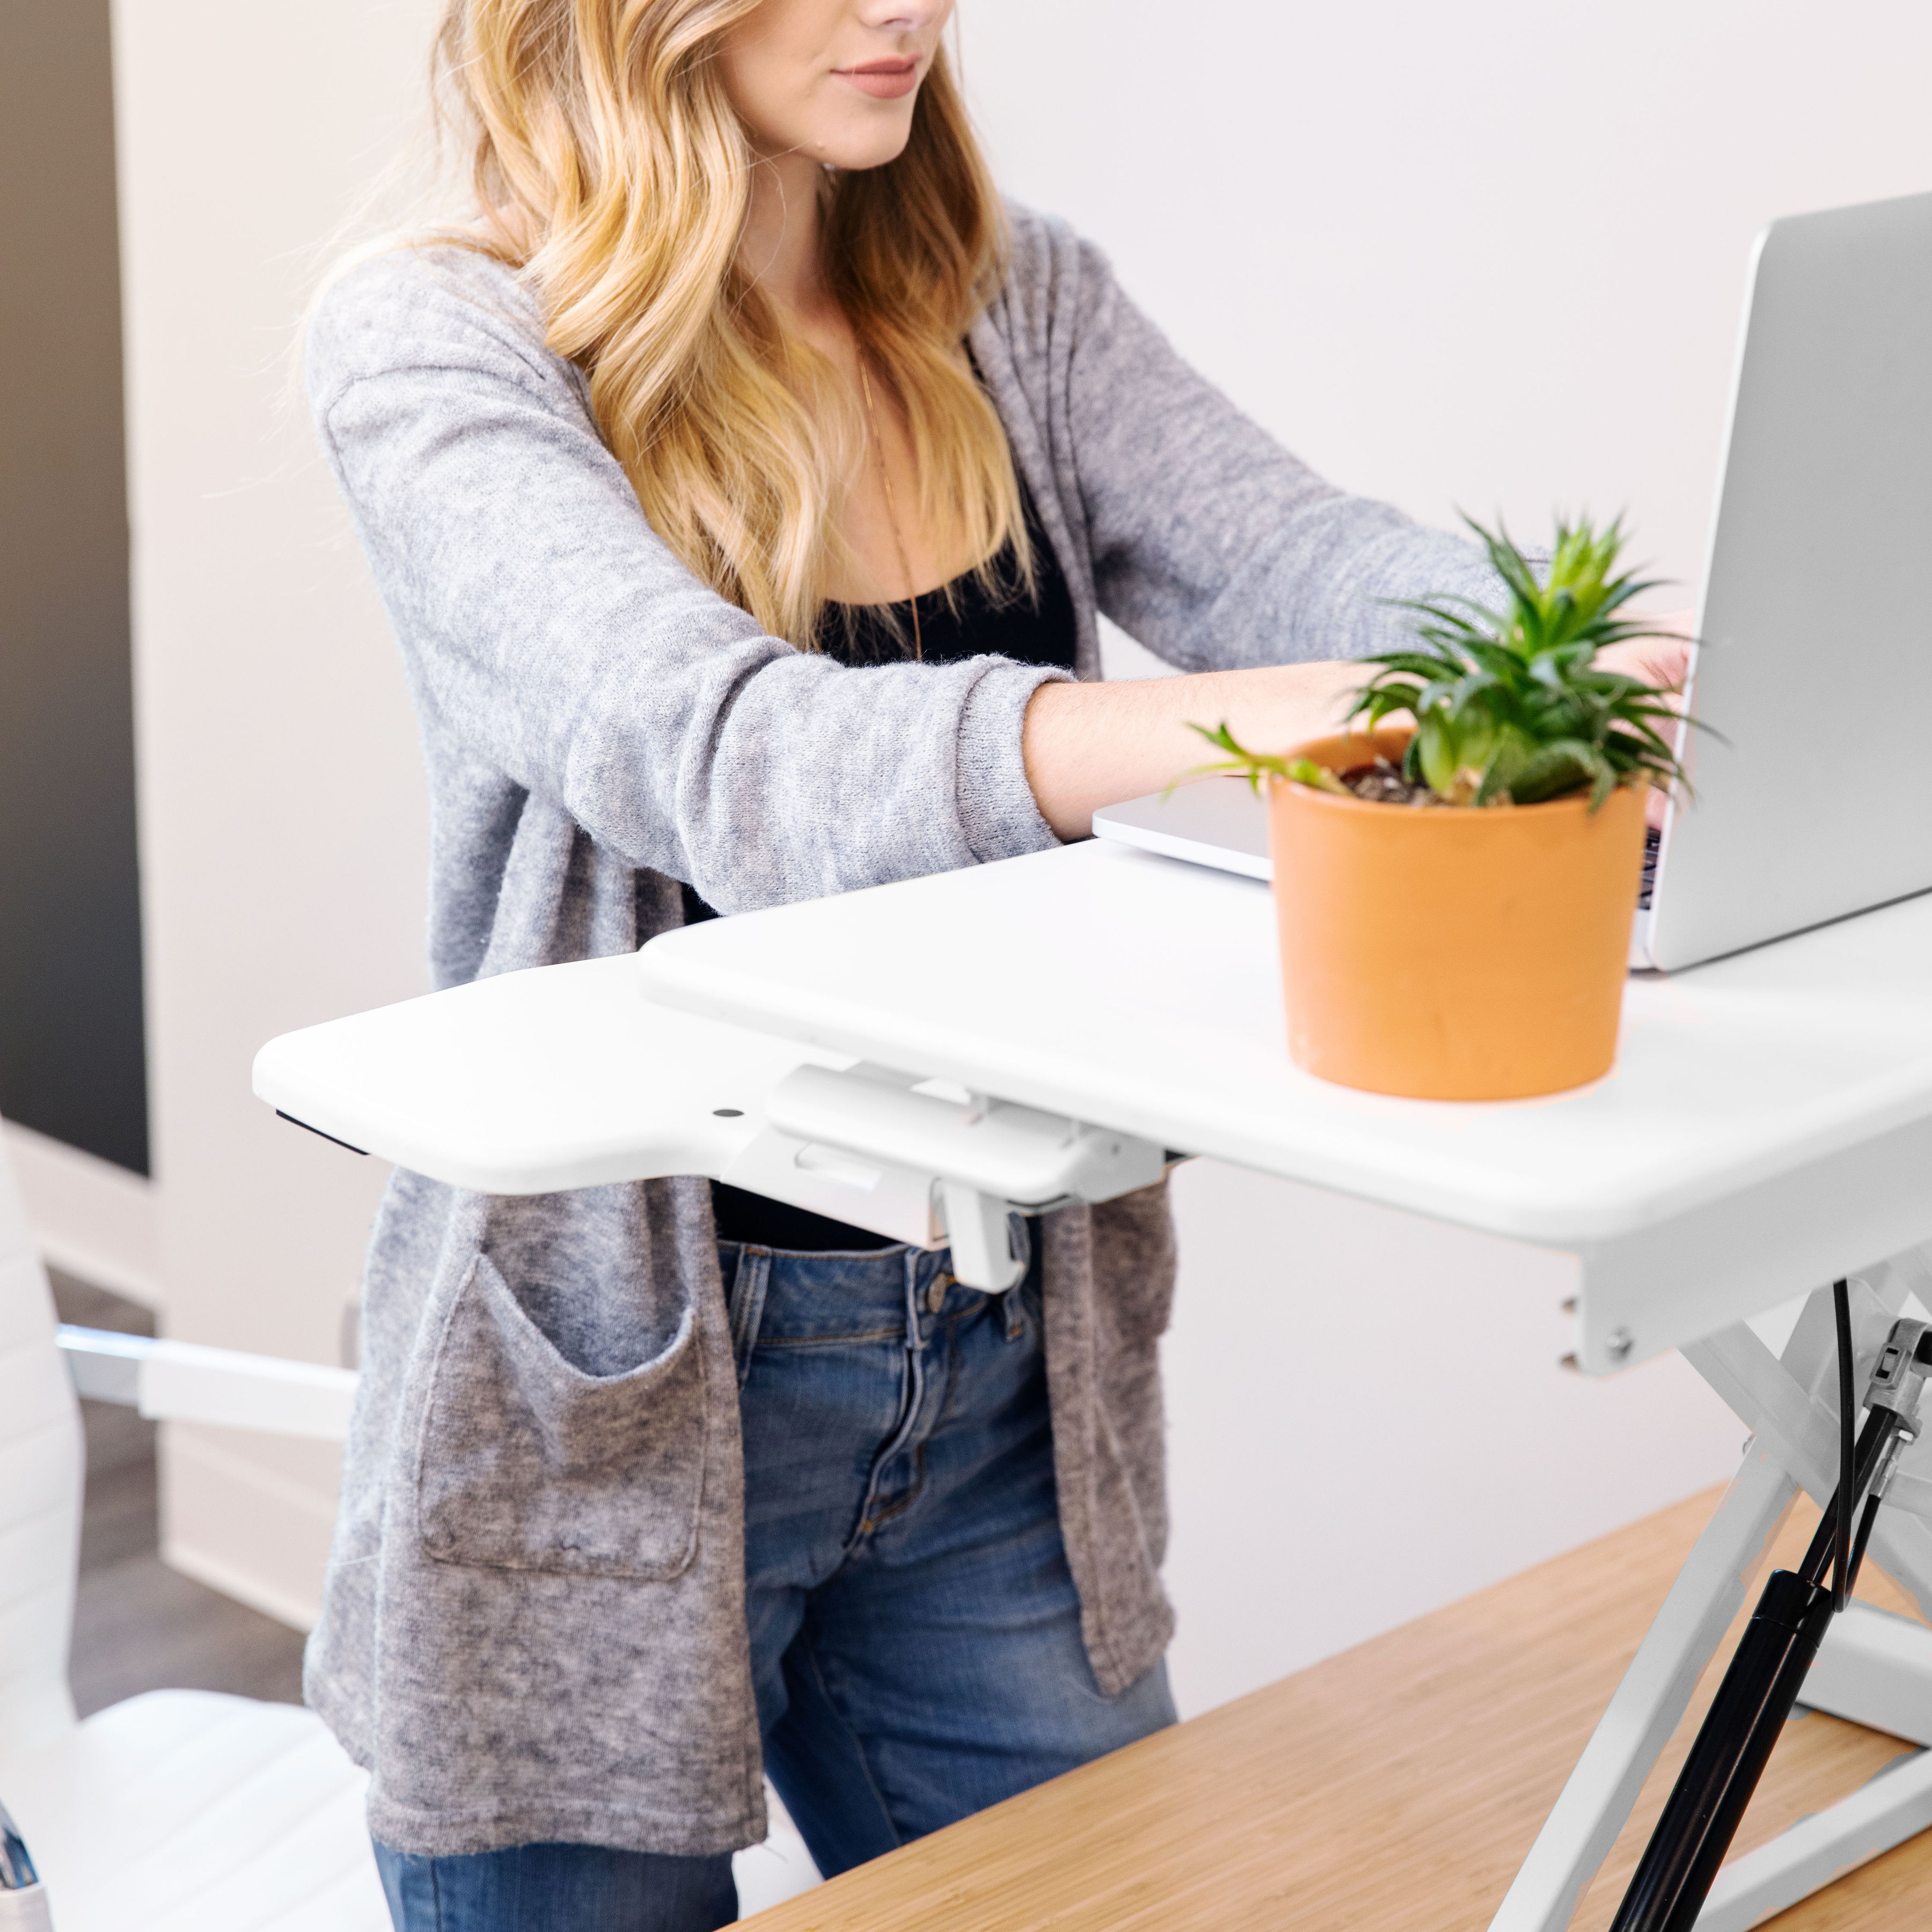 Rise-X-Light-Standing-Desk-Stand-Up-Desk-Height-Adjustable-Desk-Converter thumbnail 15